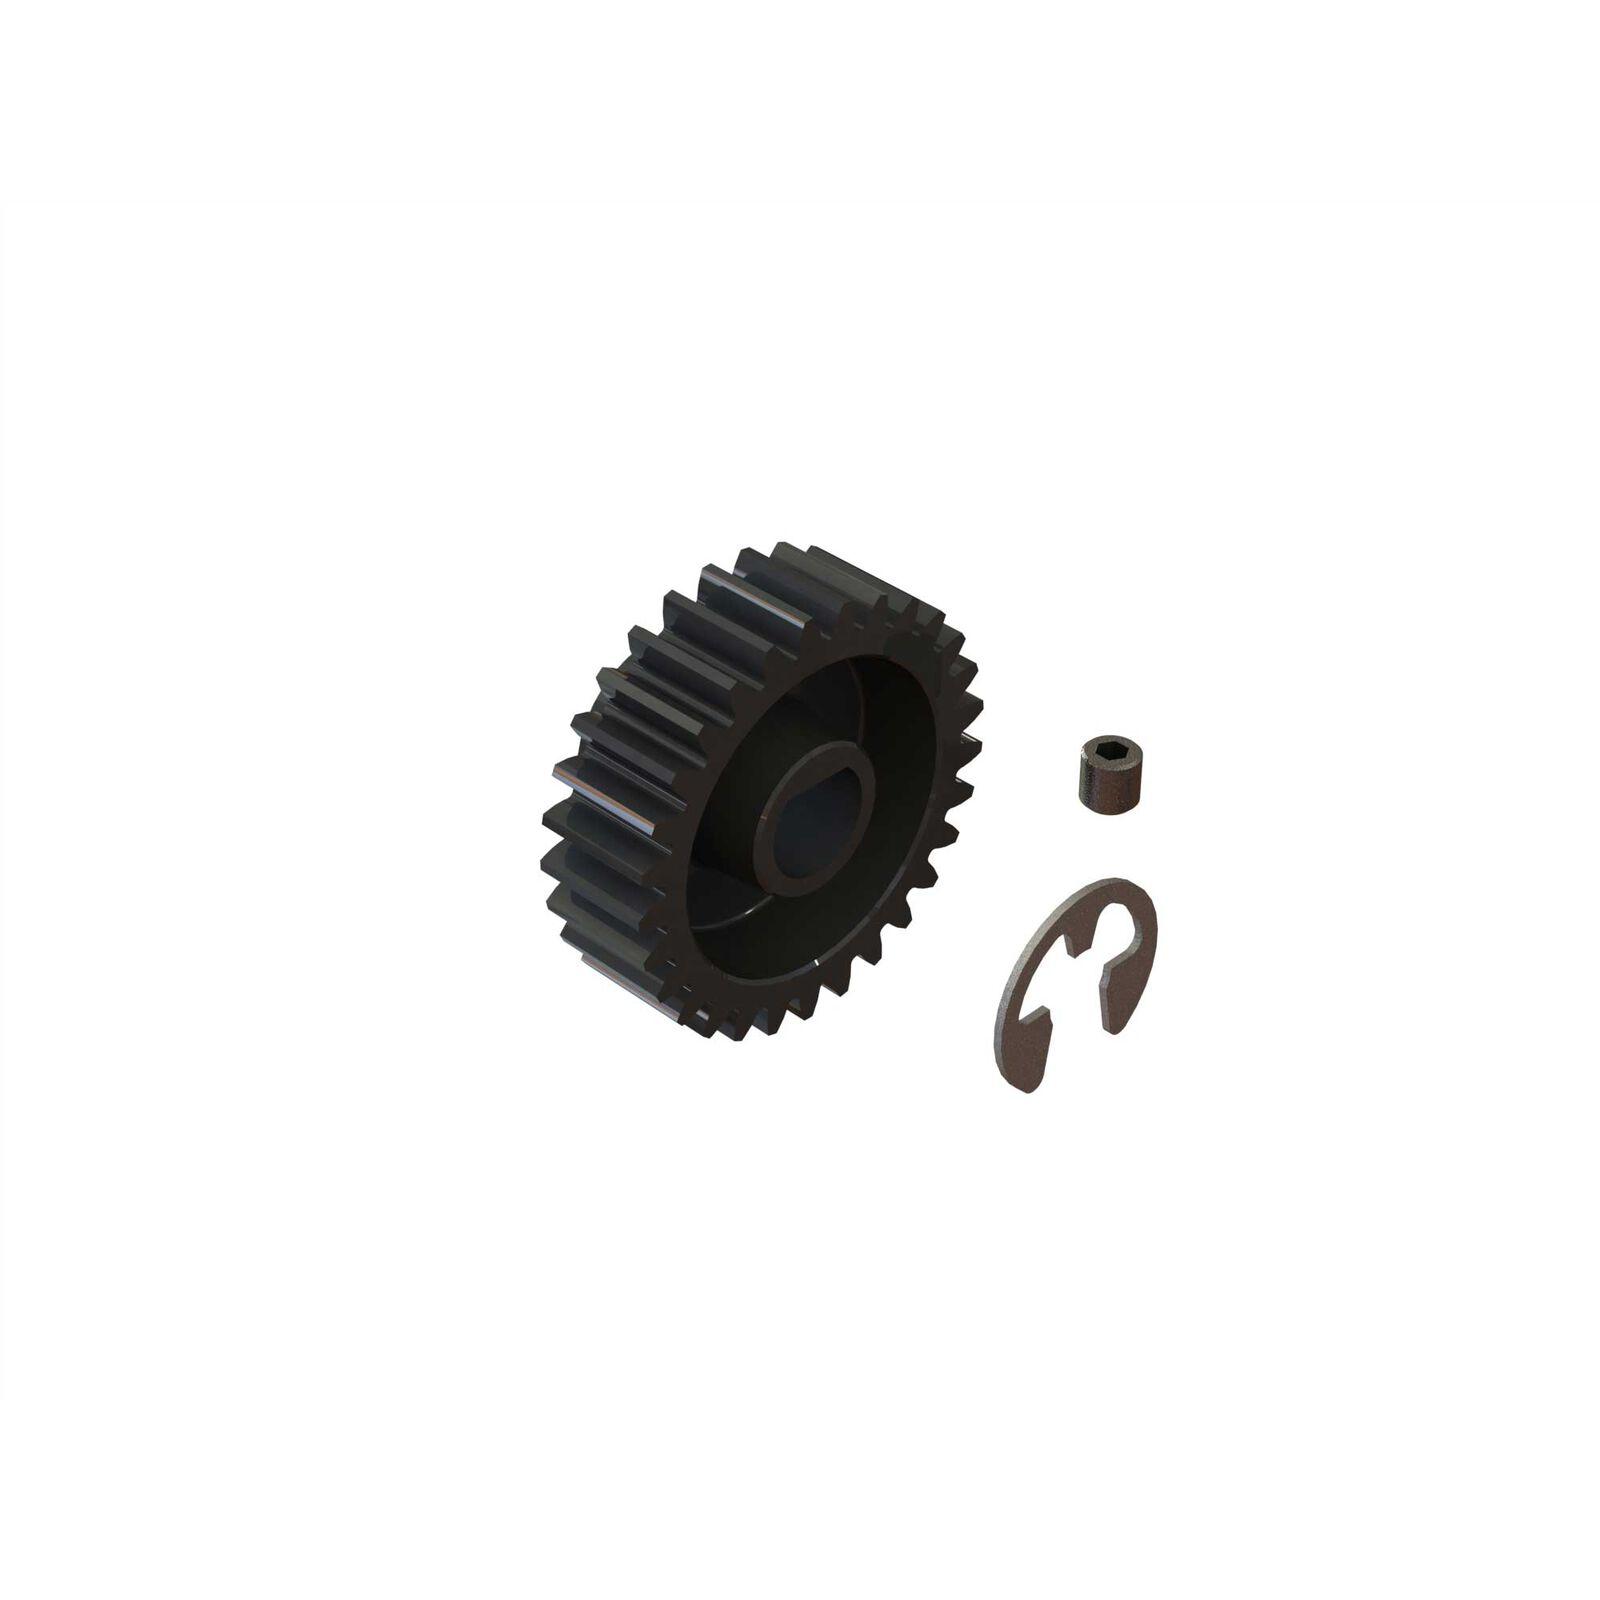 29T Mod1 Safe-D8 Pinion Gear